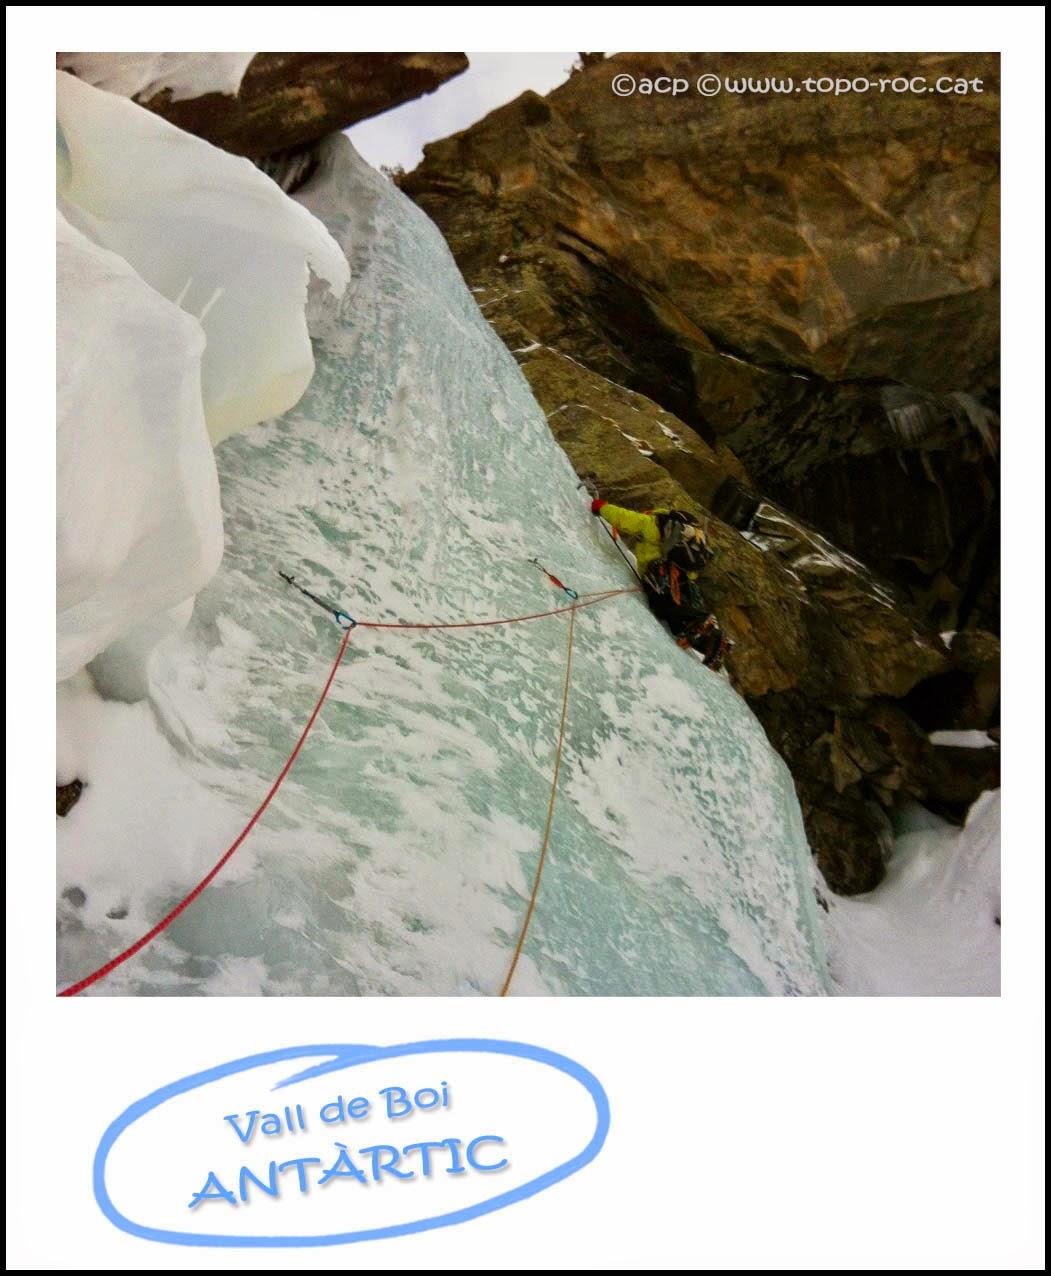 Topo-roc-Imatge-Cascada-gel-Antartic